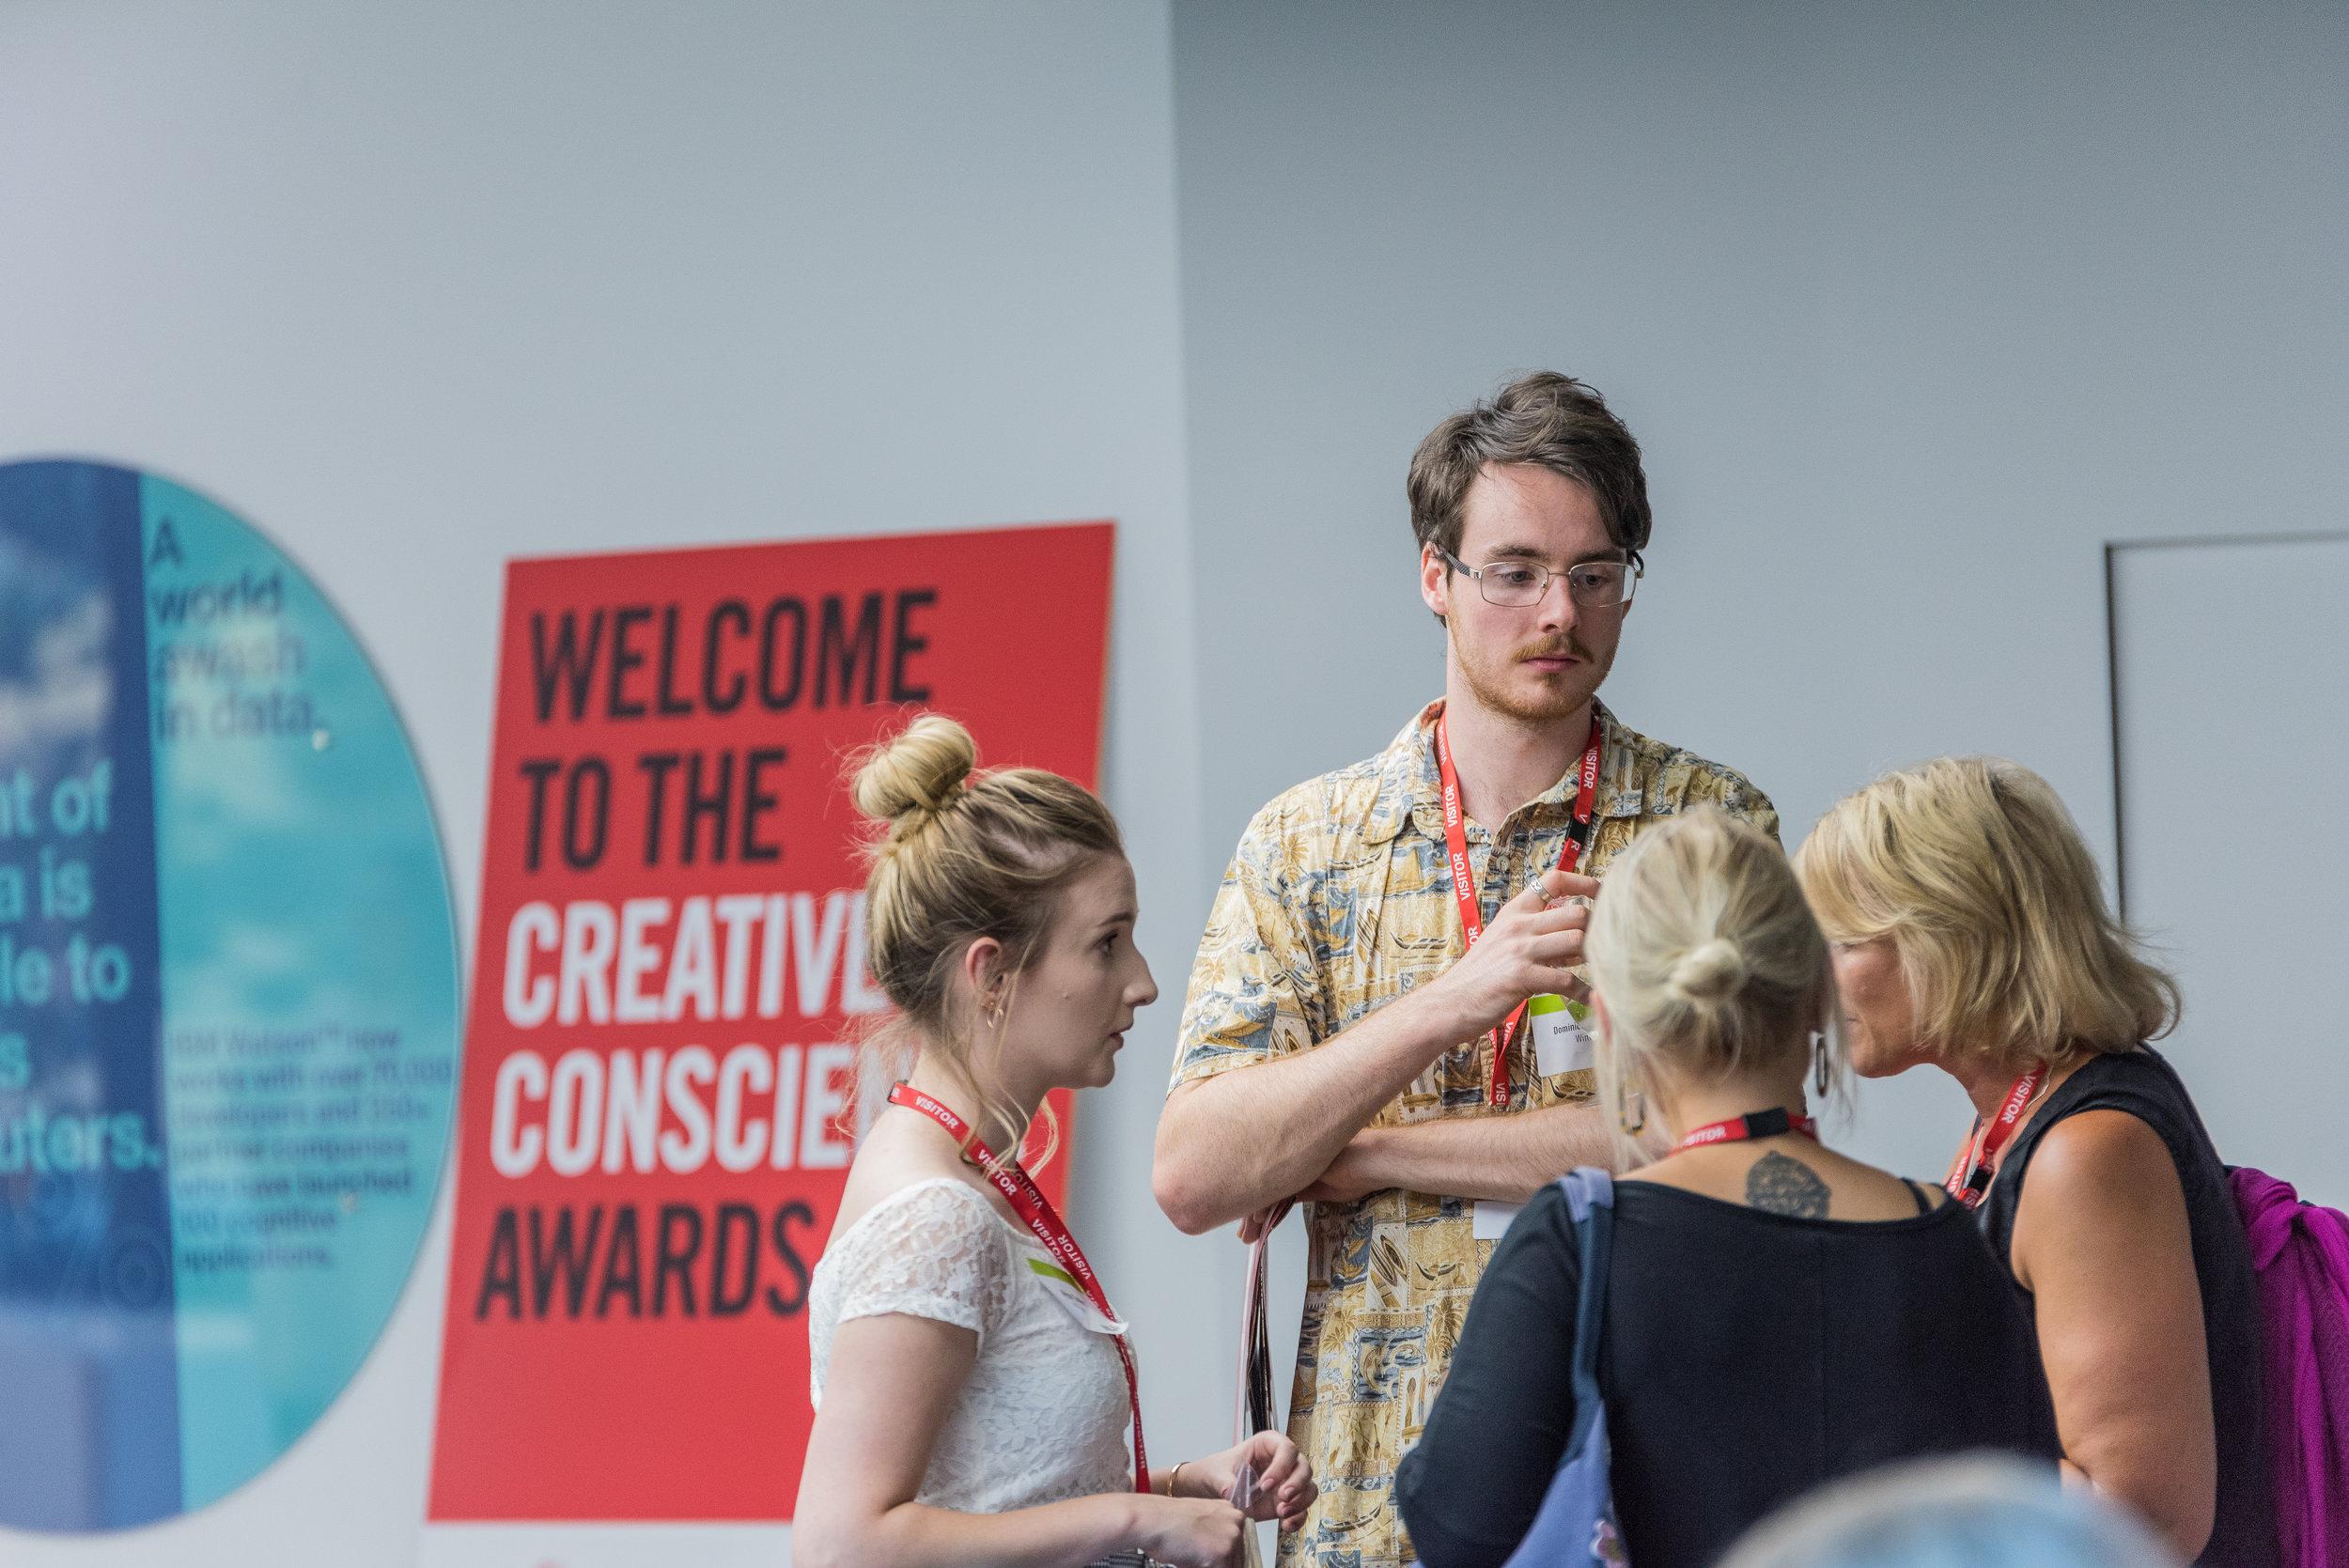 Creative Conscience Awards 2018 Photography Tunbridge Studio Portrait Photographer 030718-150.jpg